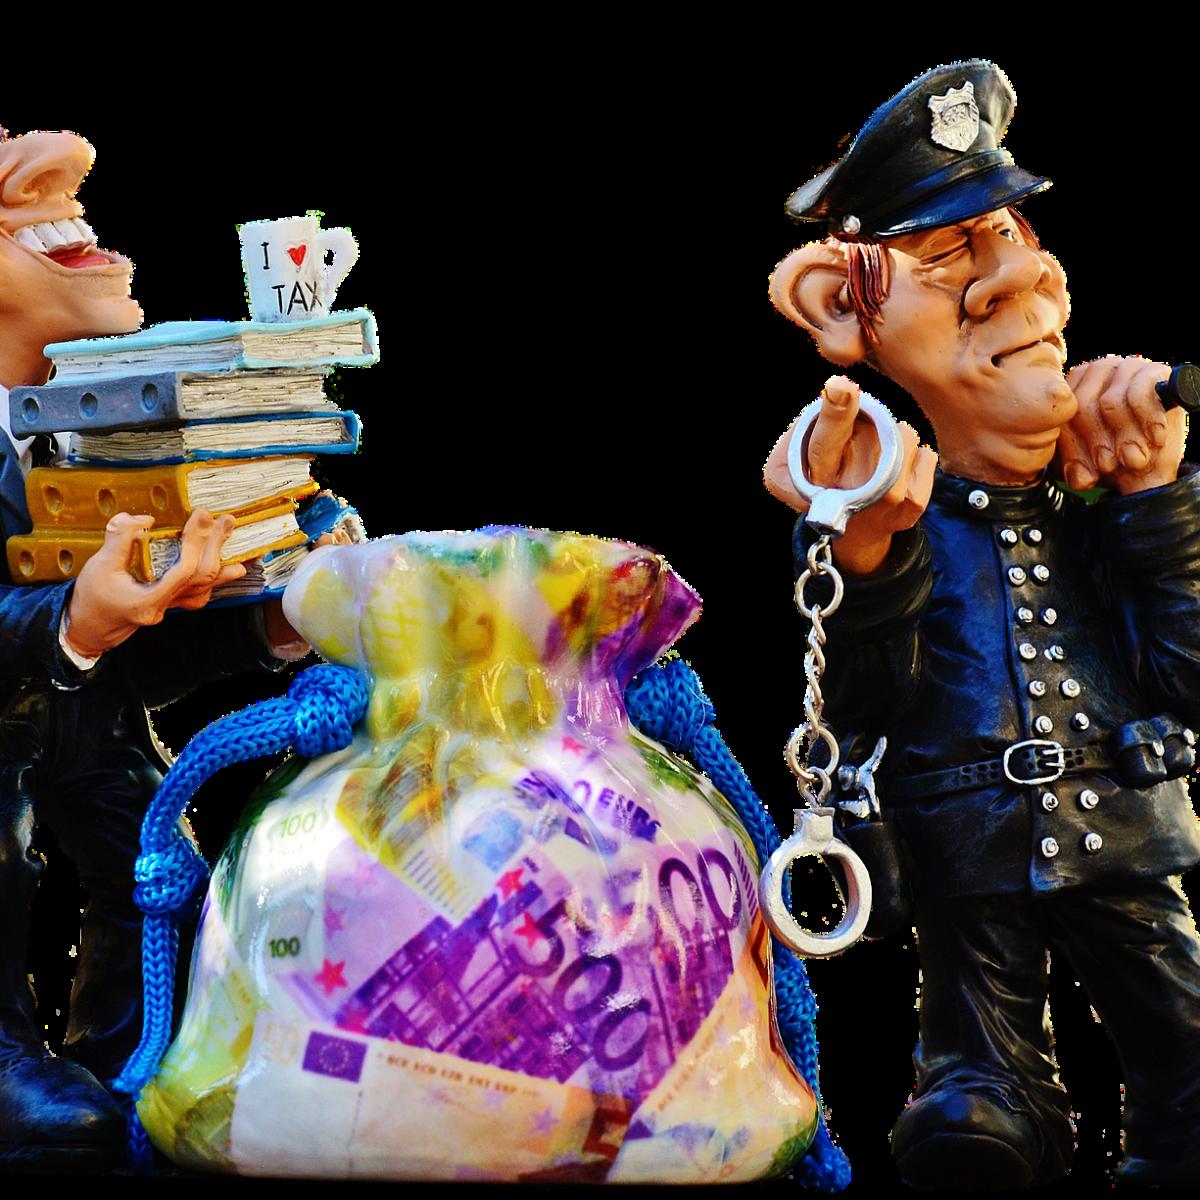 Man, taxes, tax evasion, police man, handcuffs, criminal, extortion, money